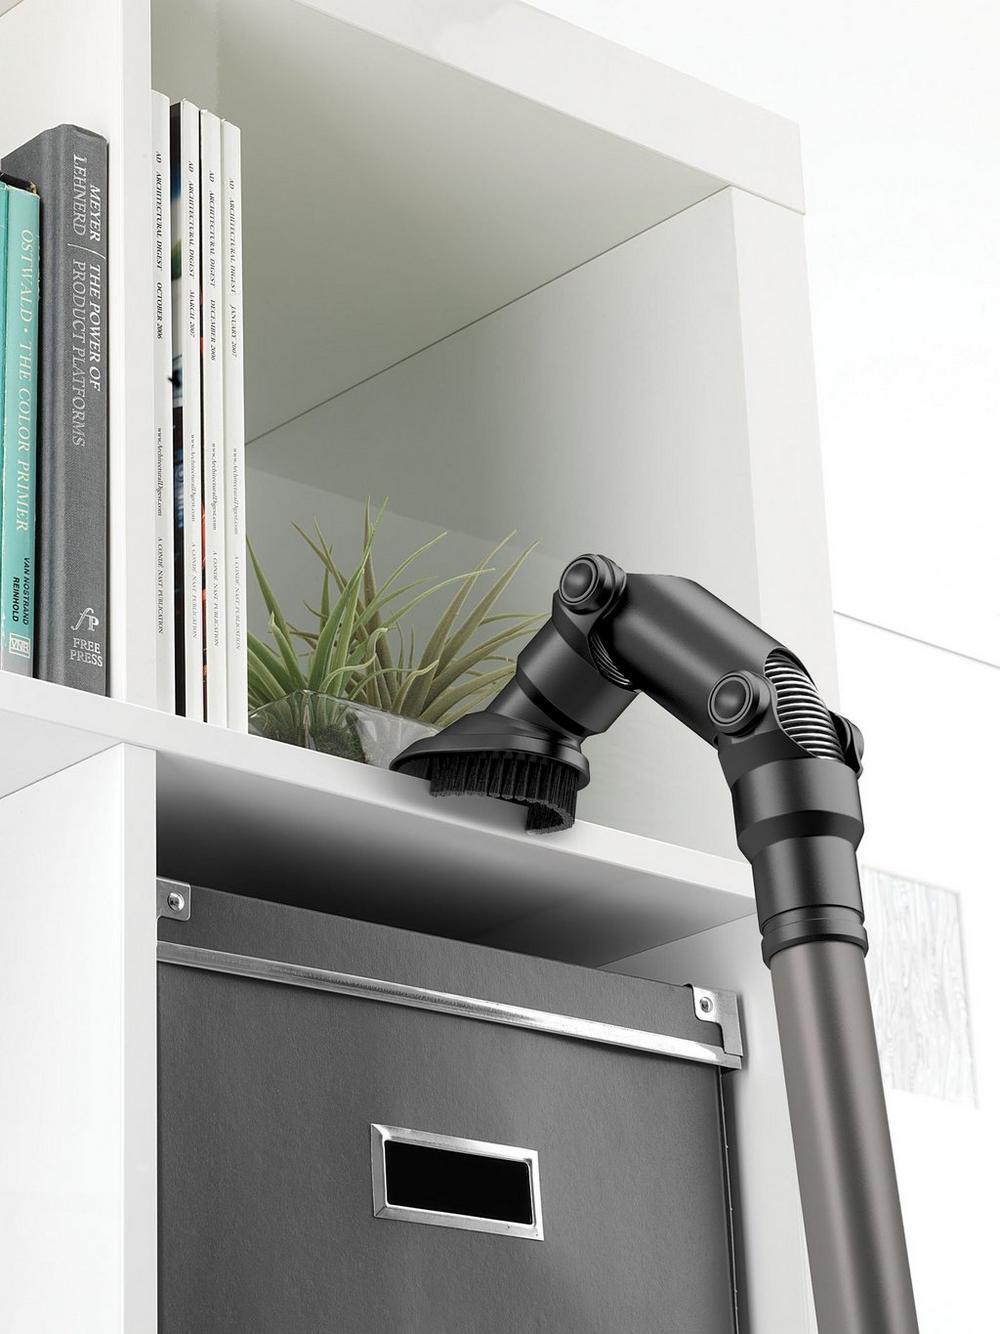 Air Cordless Deluxe Upright Vacuum with Bonus Tools8